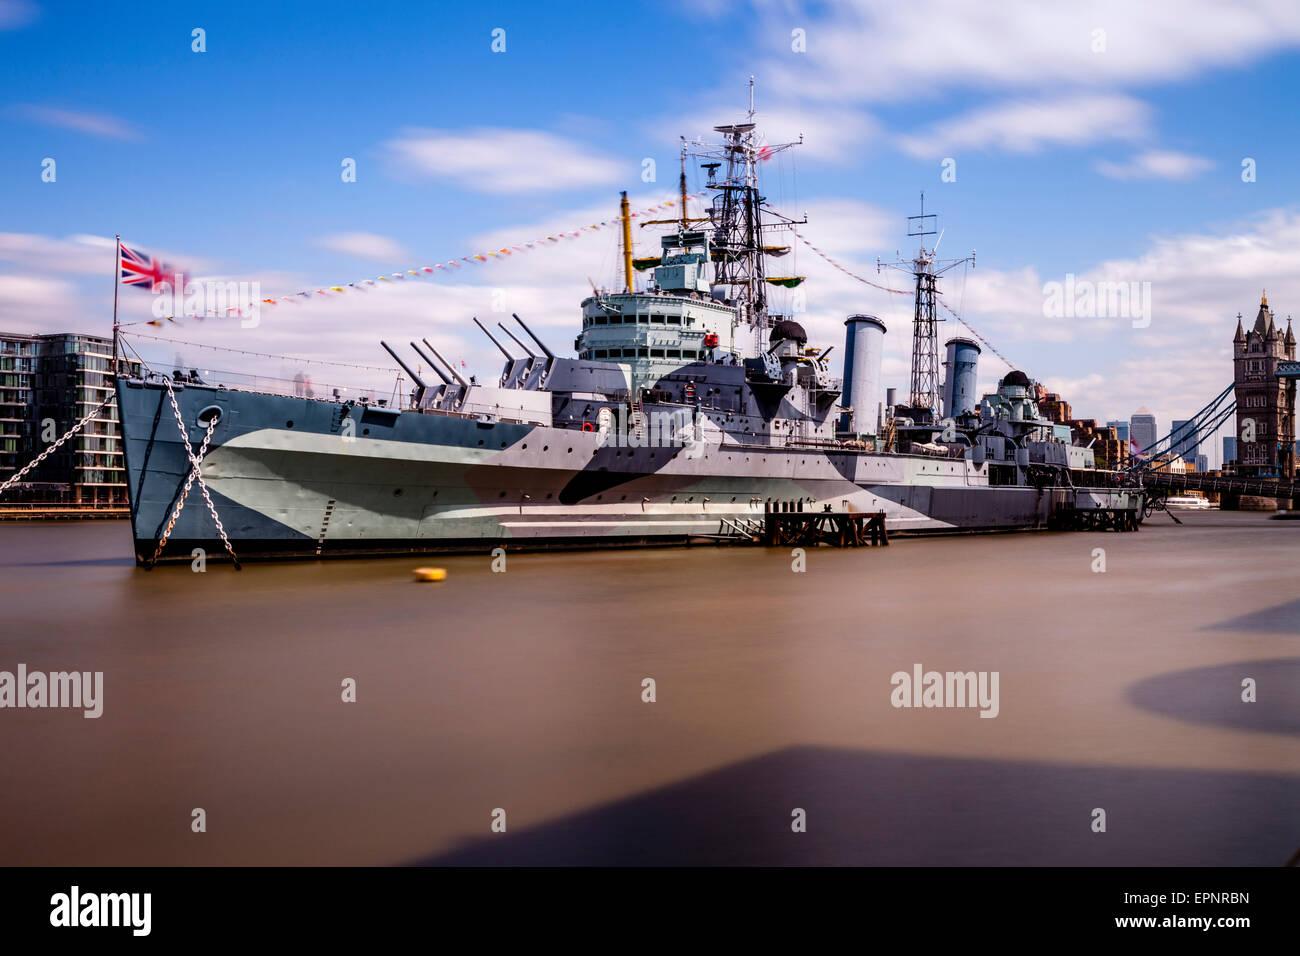 HMS Belfast, River Thames, London, England - Stock Image